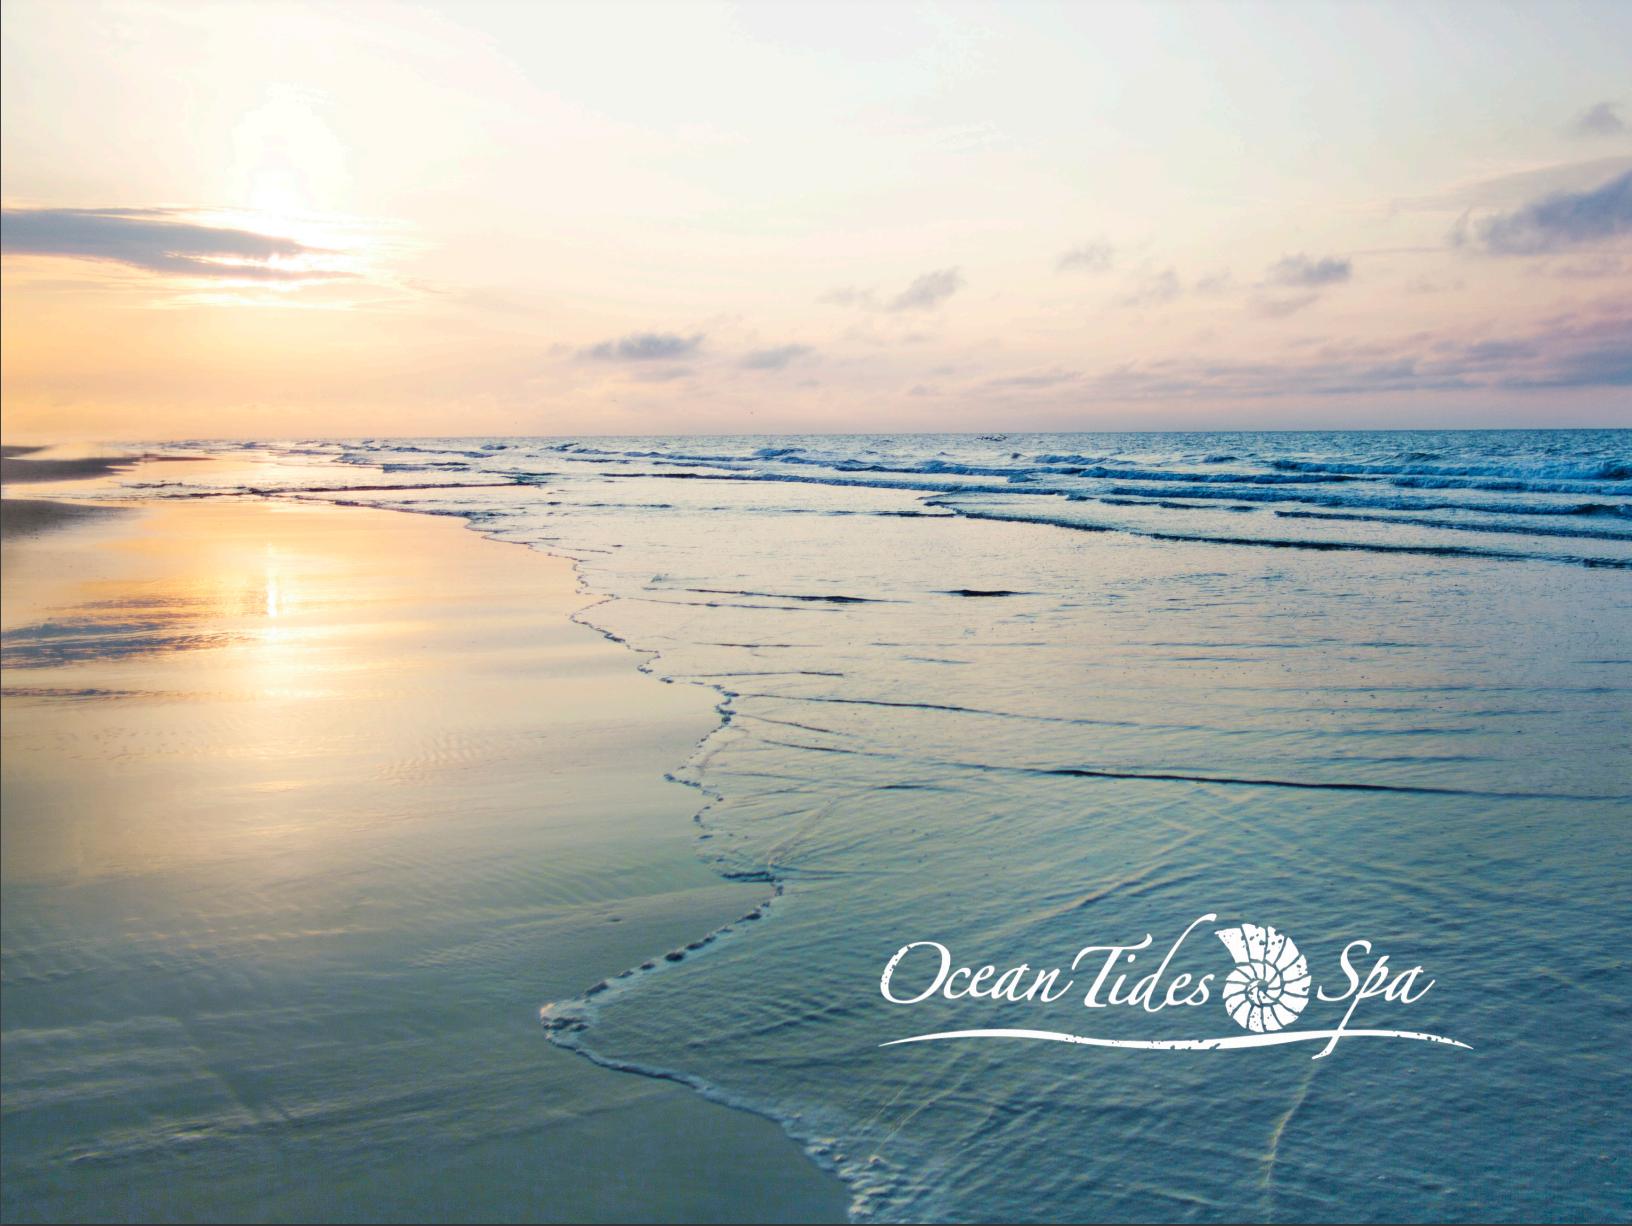 Ocean Tides Spa